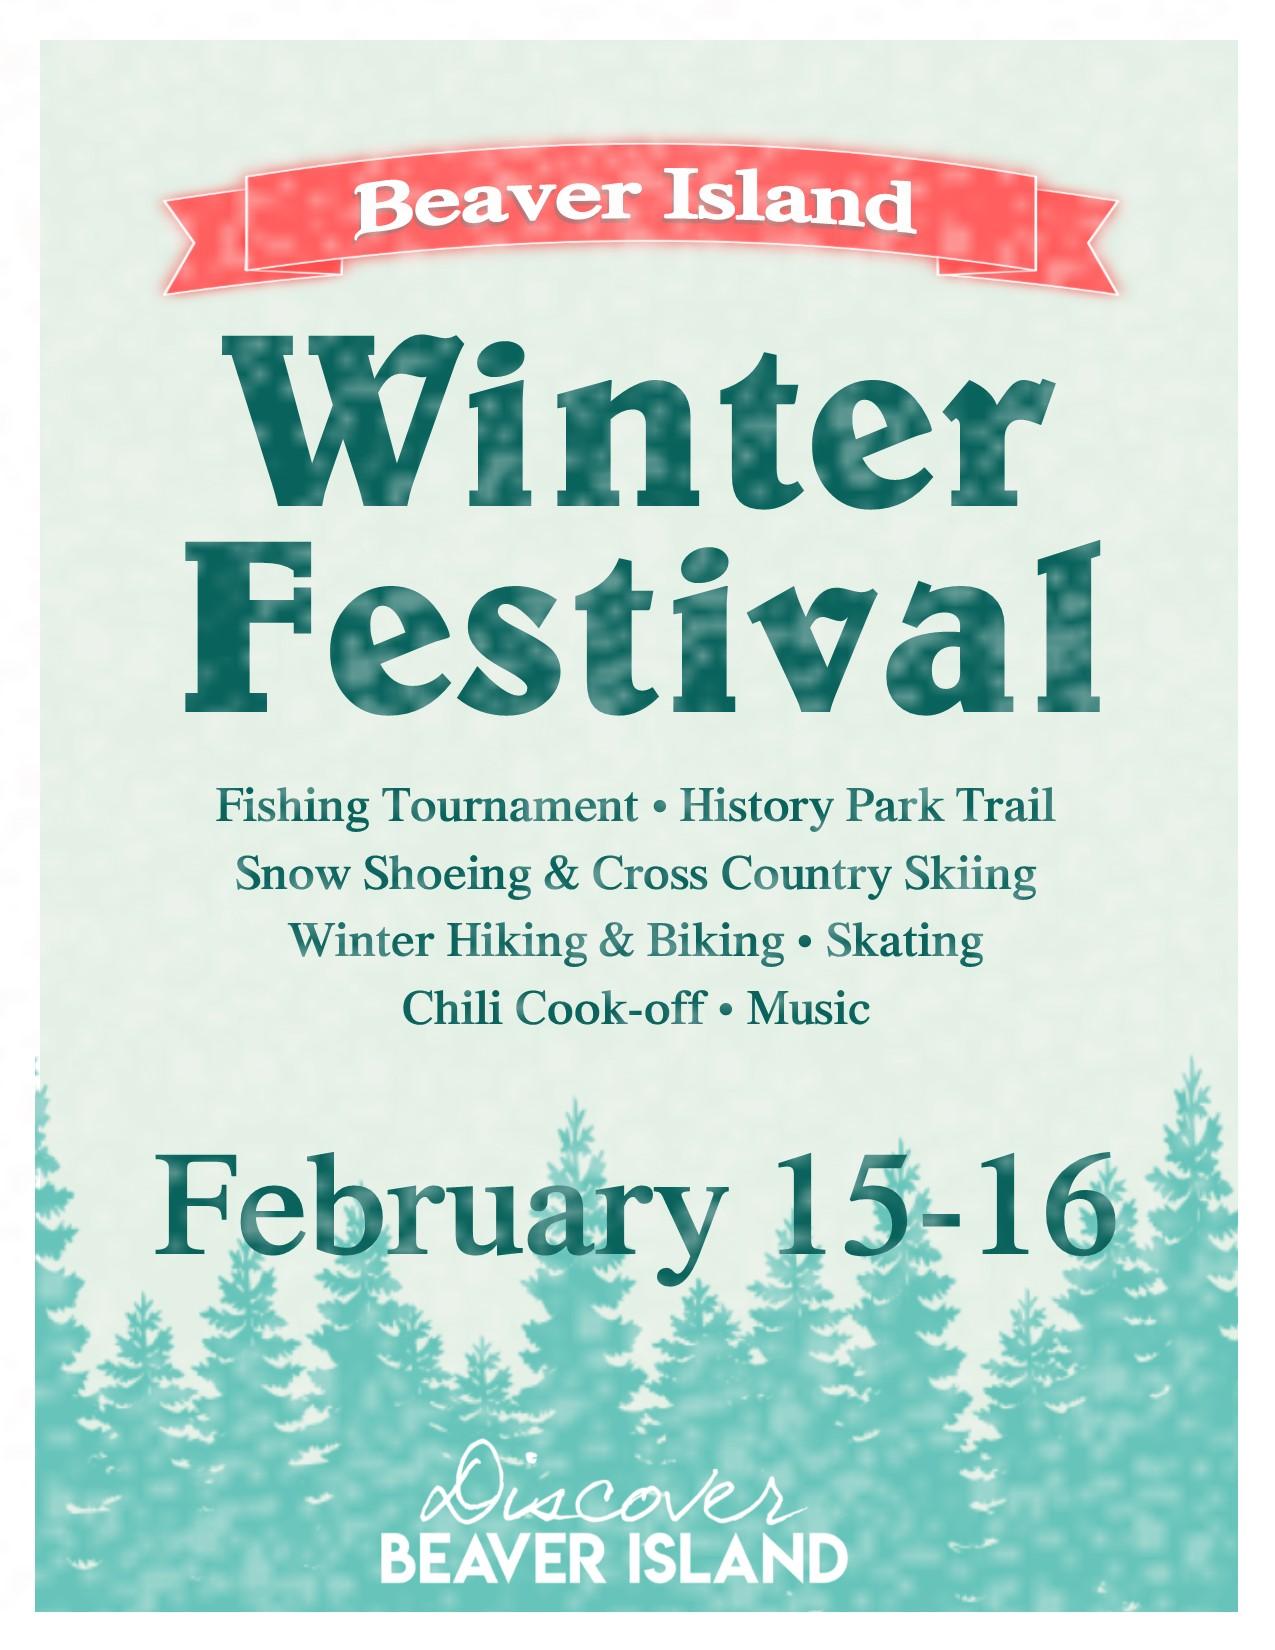 Winter Festival